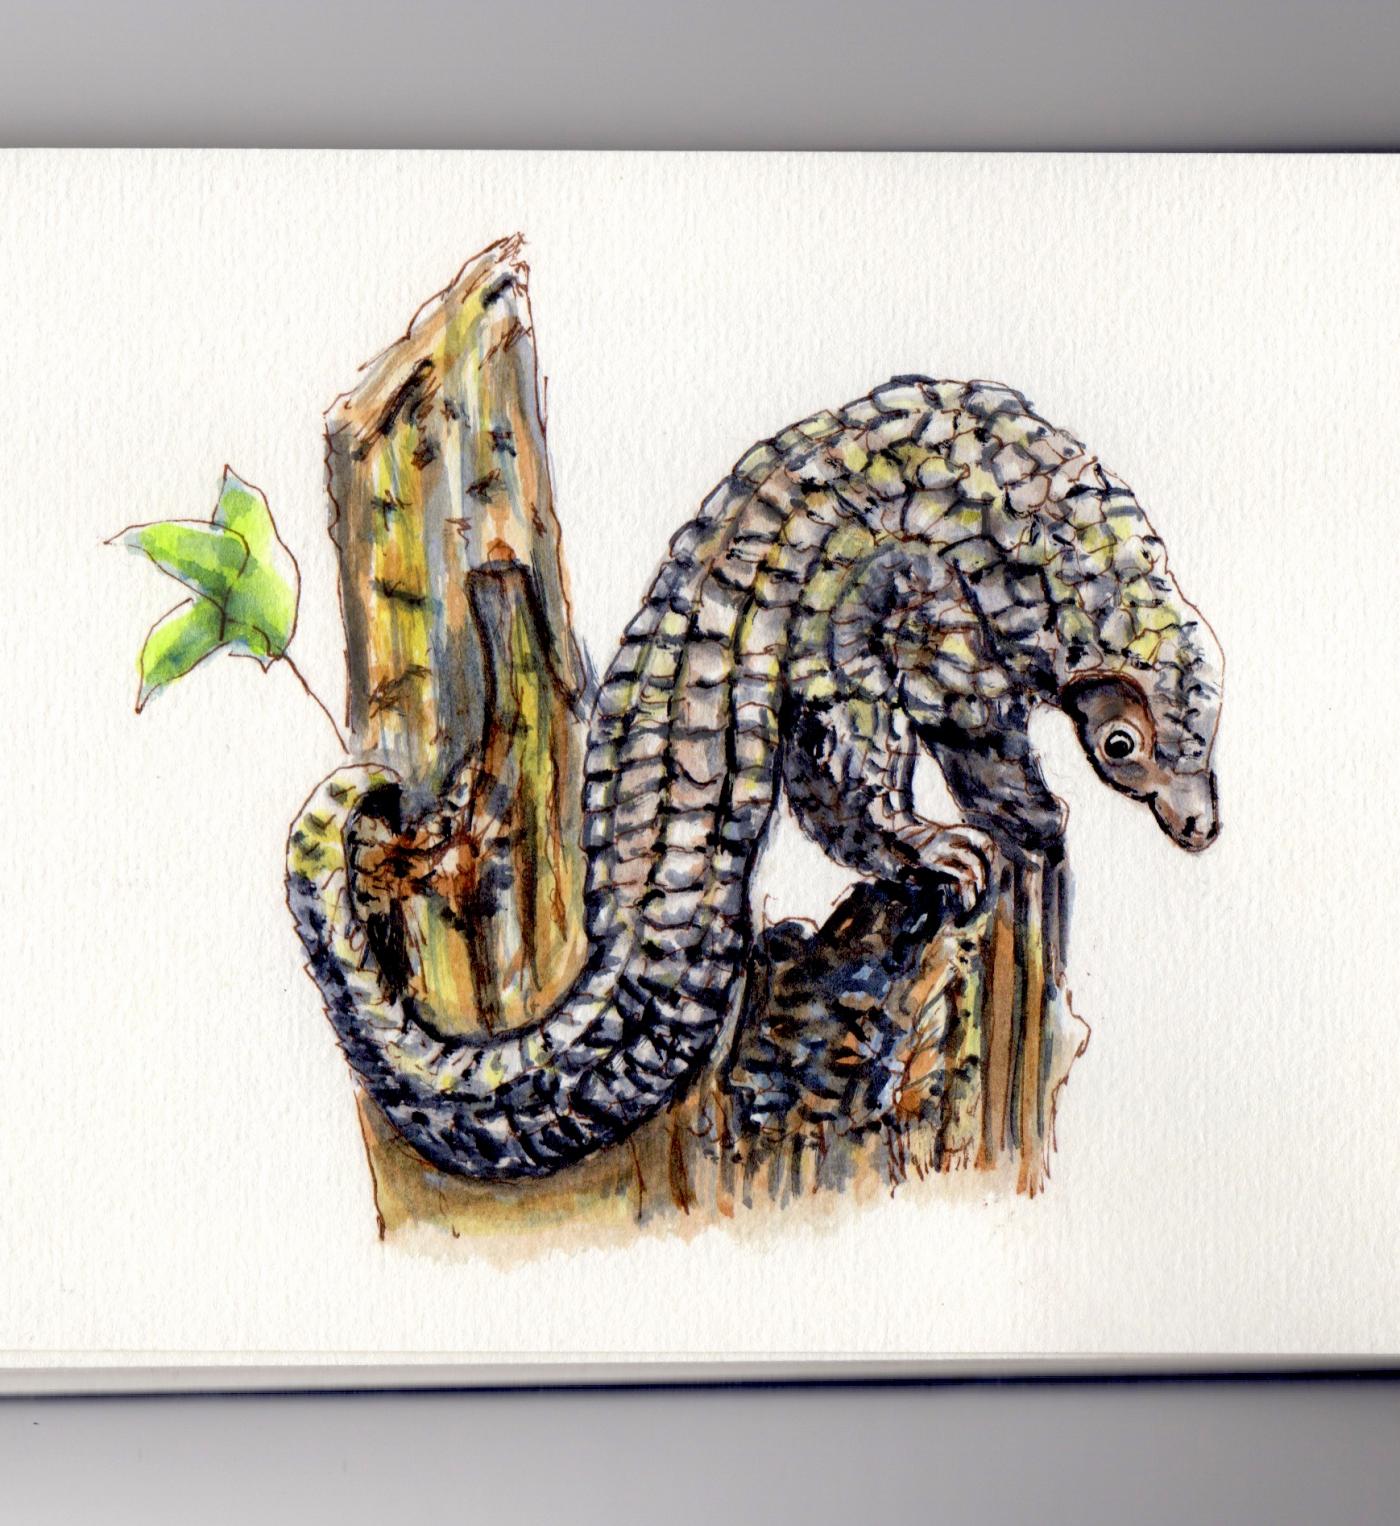 Doodlewash of Pangolin - Endangered Species in watercolor sketch painting Red List